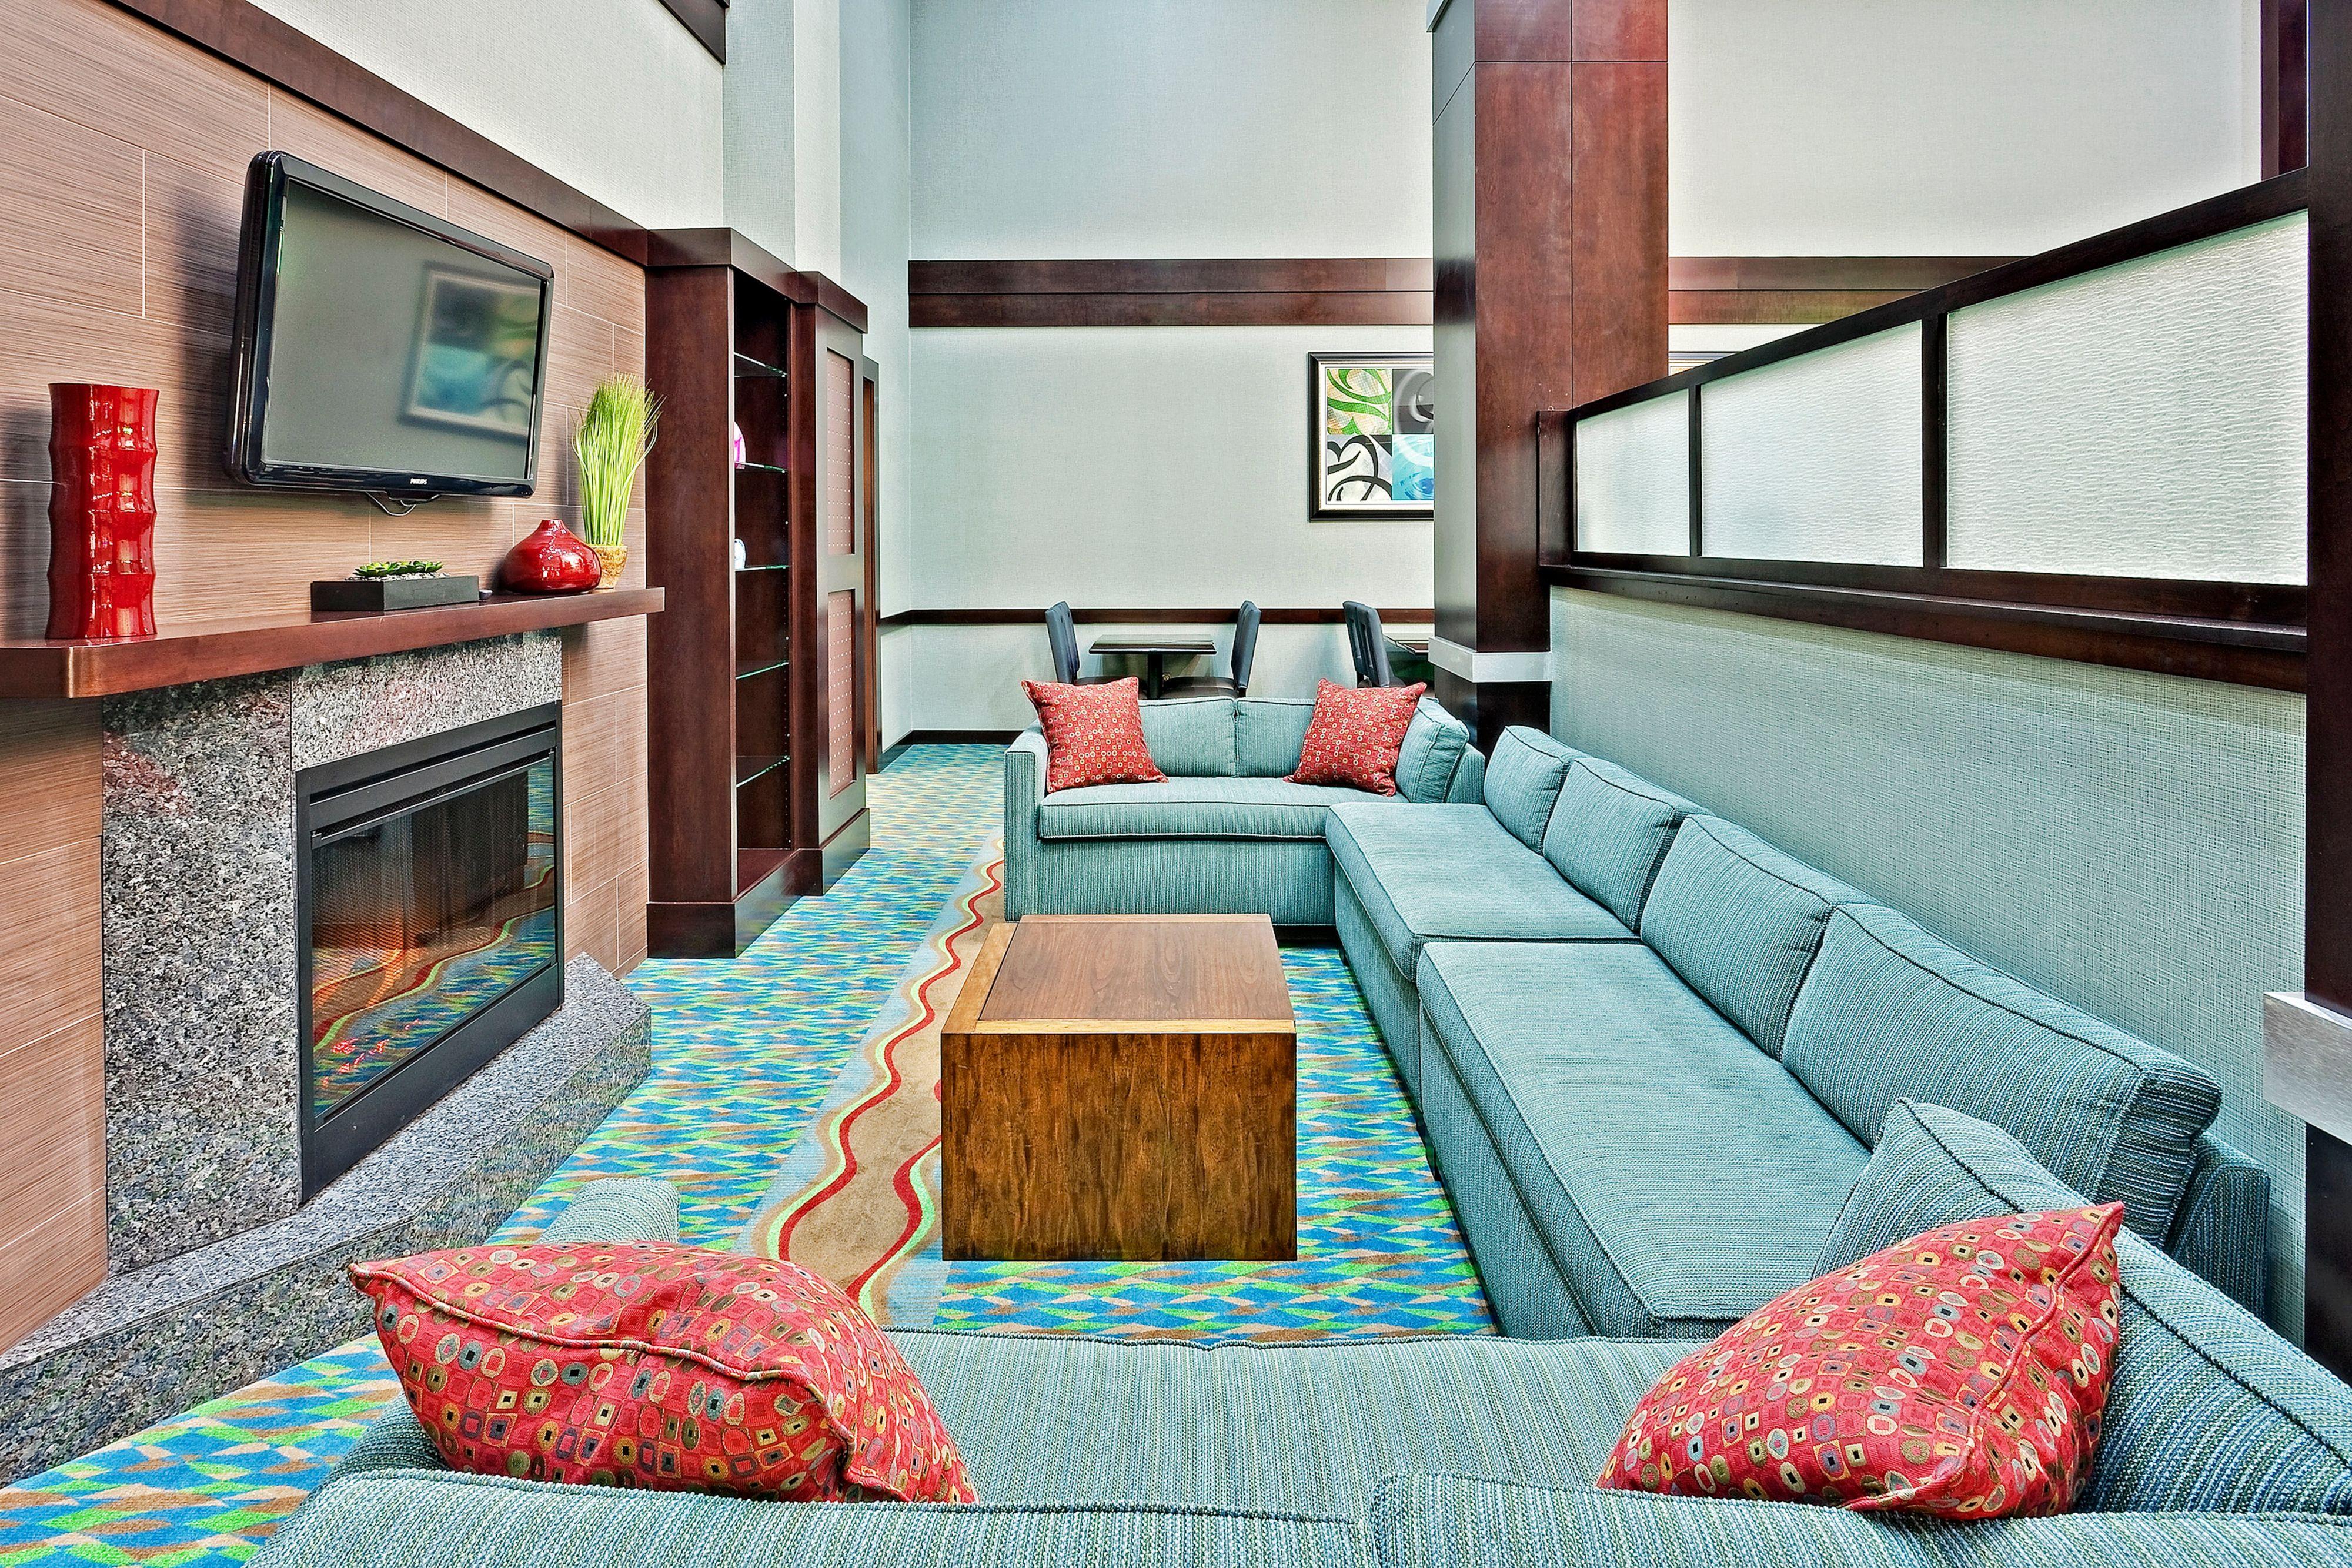 Holiday Inn Express & Suites New Philadelphia image 5